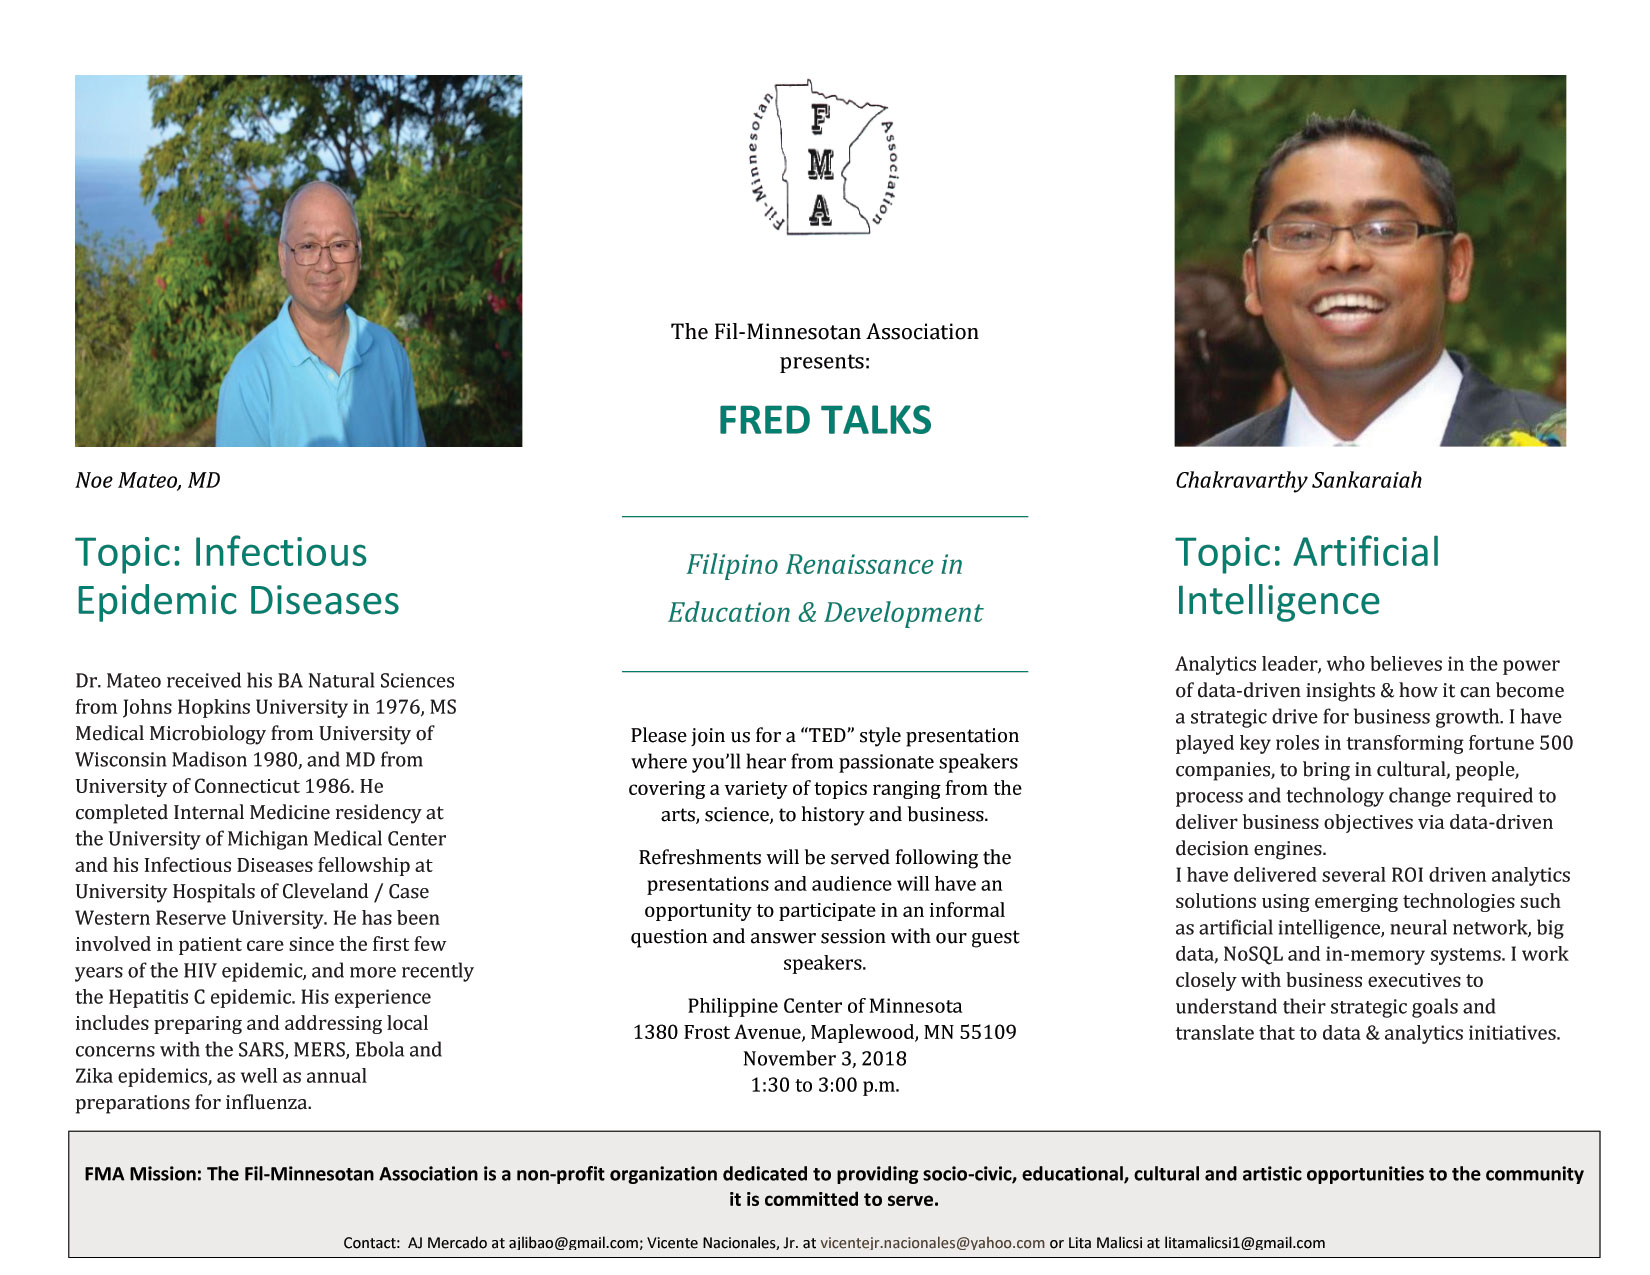 FRED-Talks-flyer-11-2018.jpg